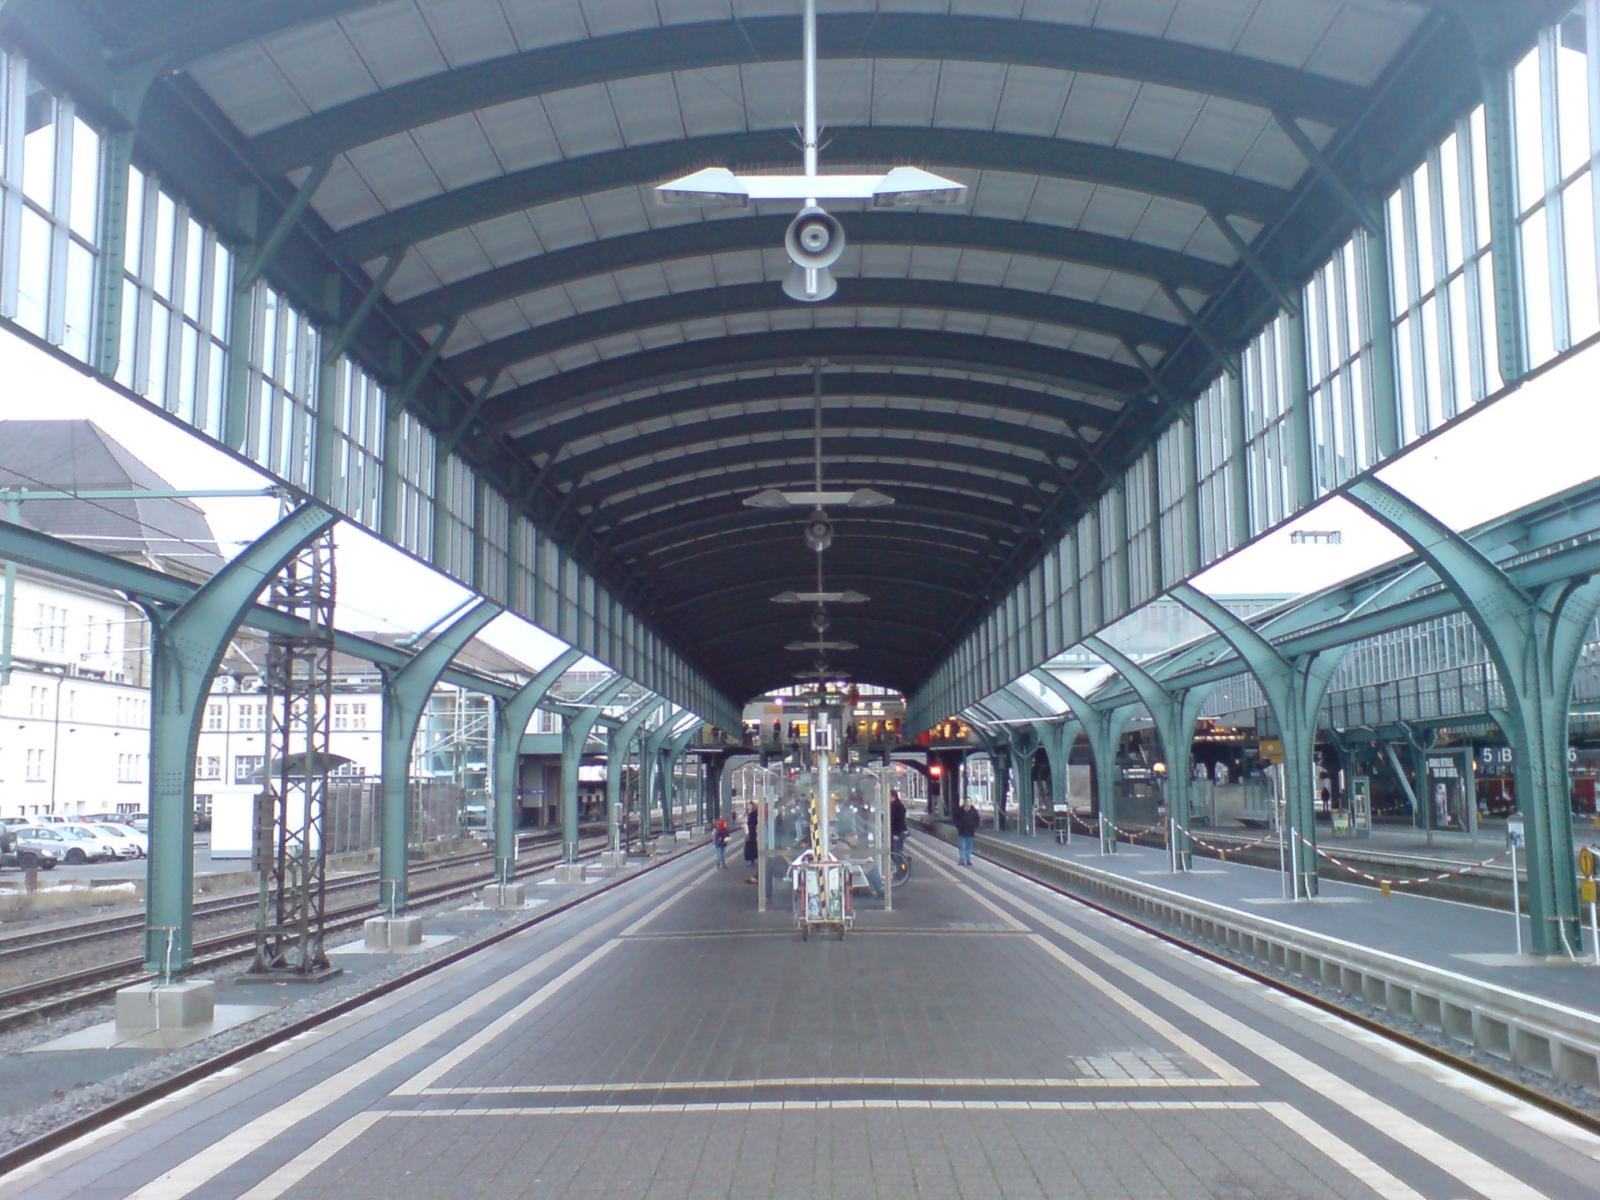 FileBarrel Roofs Of Darmstadt Hauptbahnhofjpg Wikimedia Commons